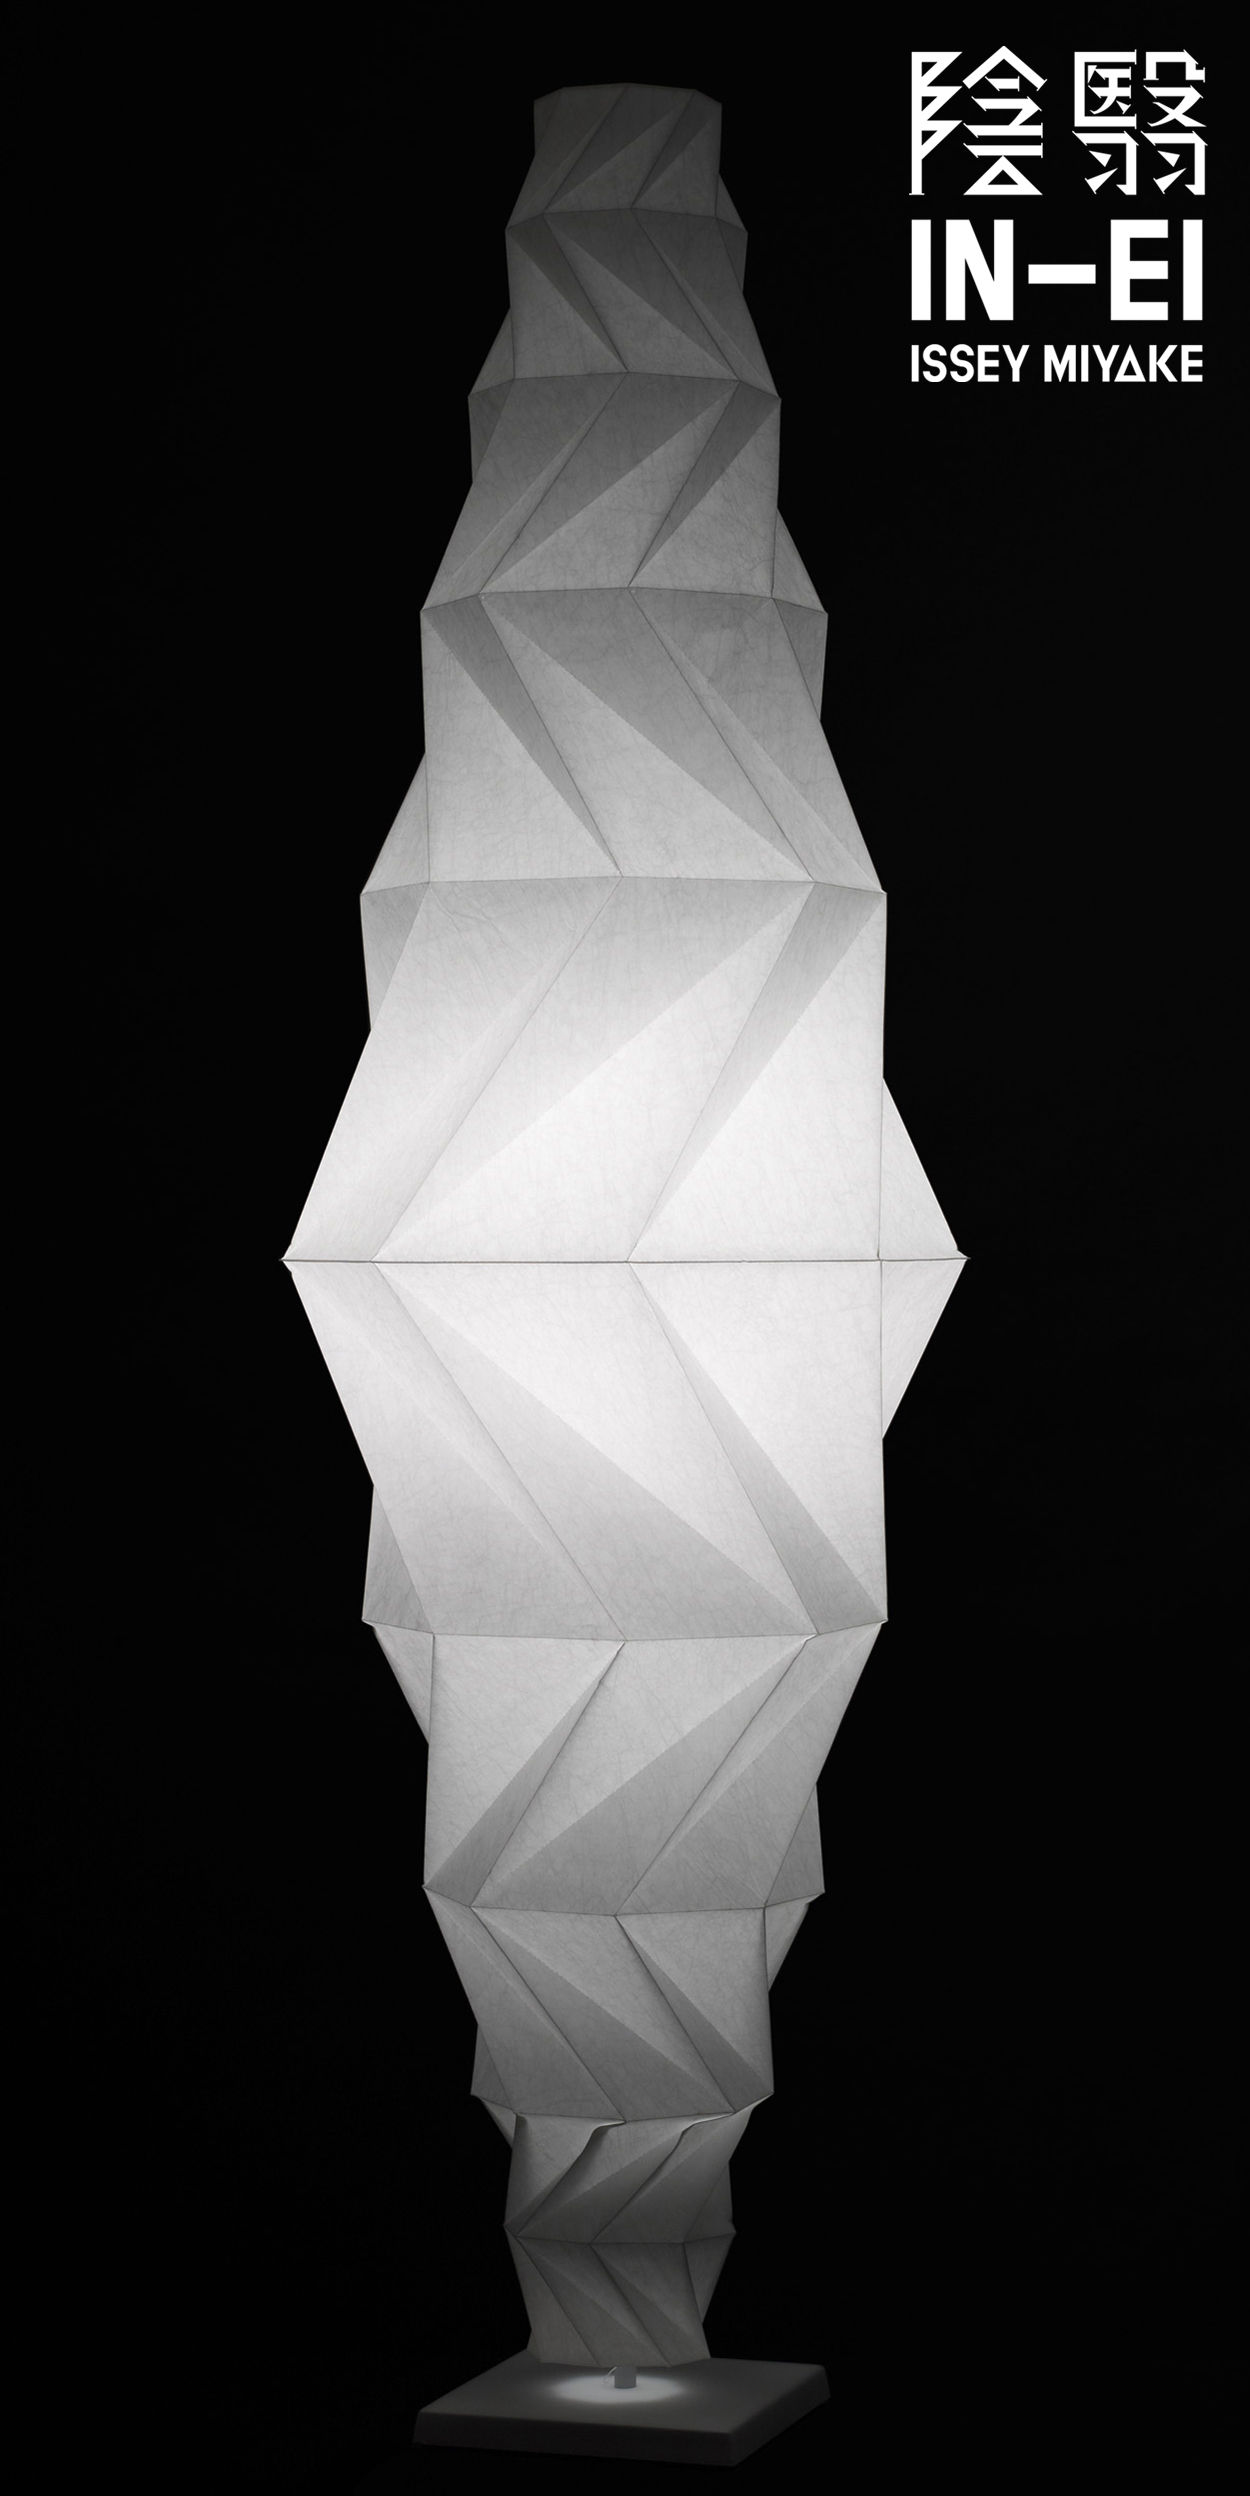 Luminaire - Lampadaires - Lampadaire IN-EI Minomushi LED / Ø 62 x H 195 cm - Artemide - Blanc - Aluminium peint, Fibre PET recyclée